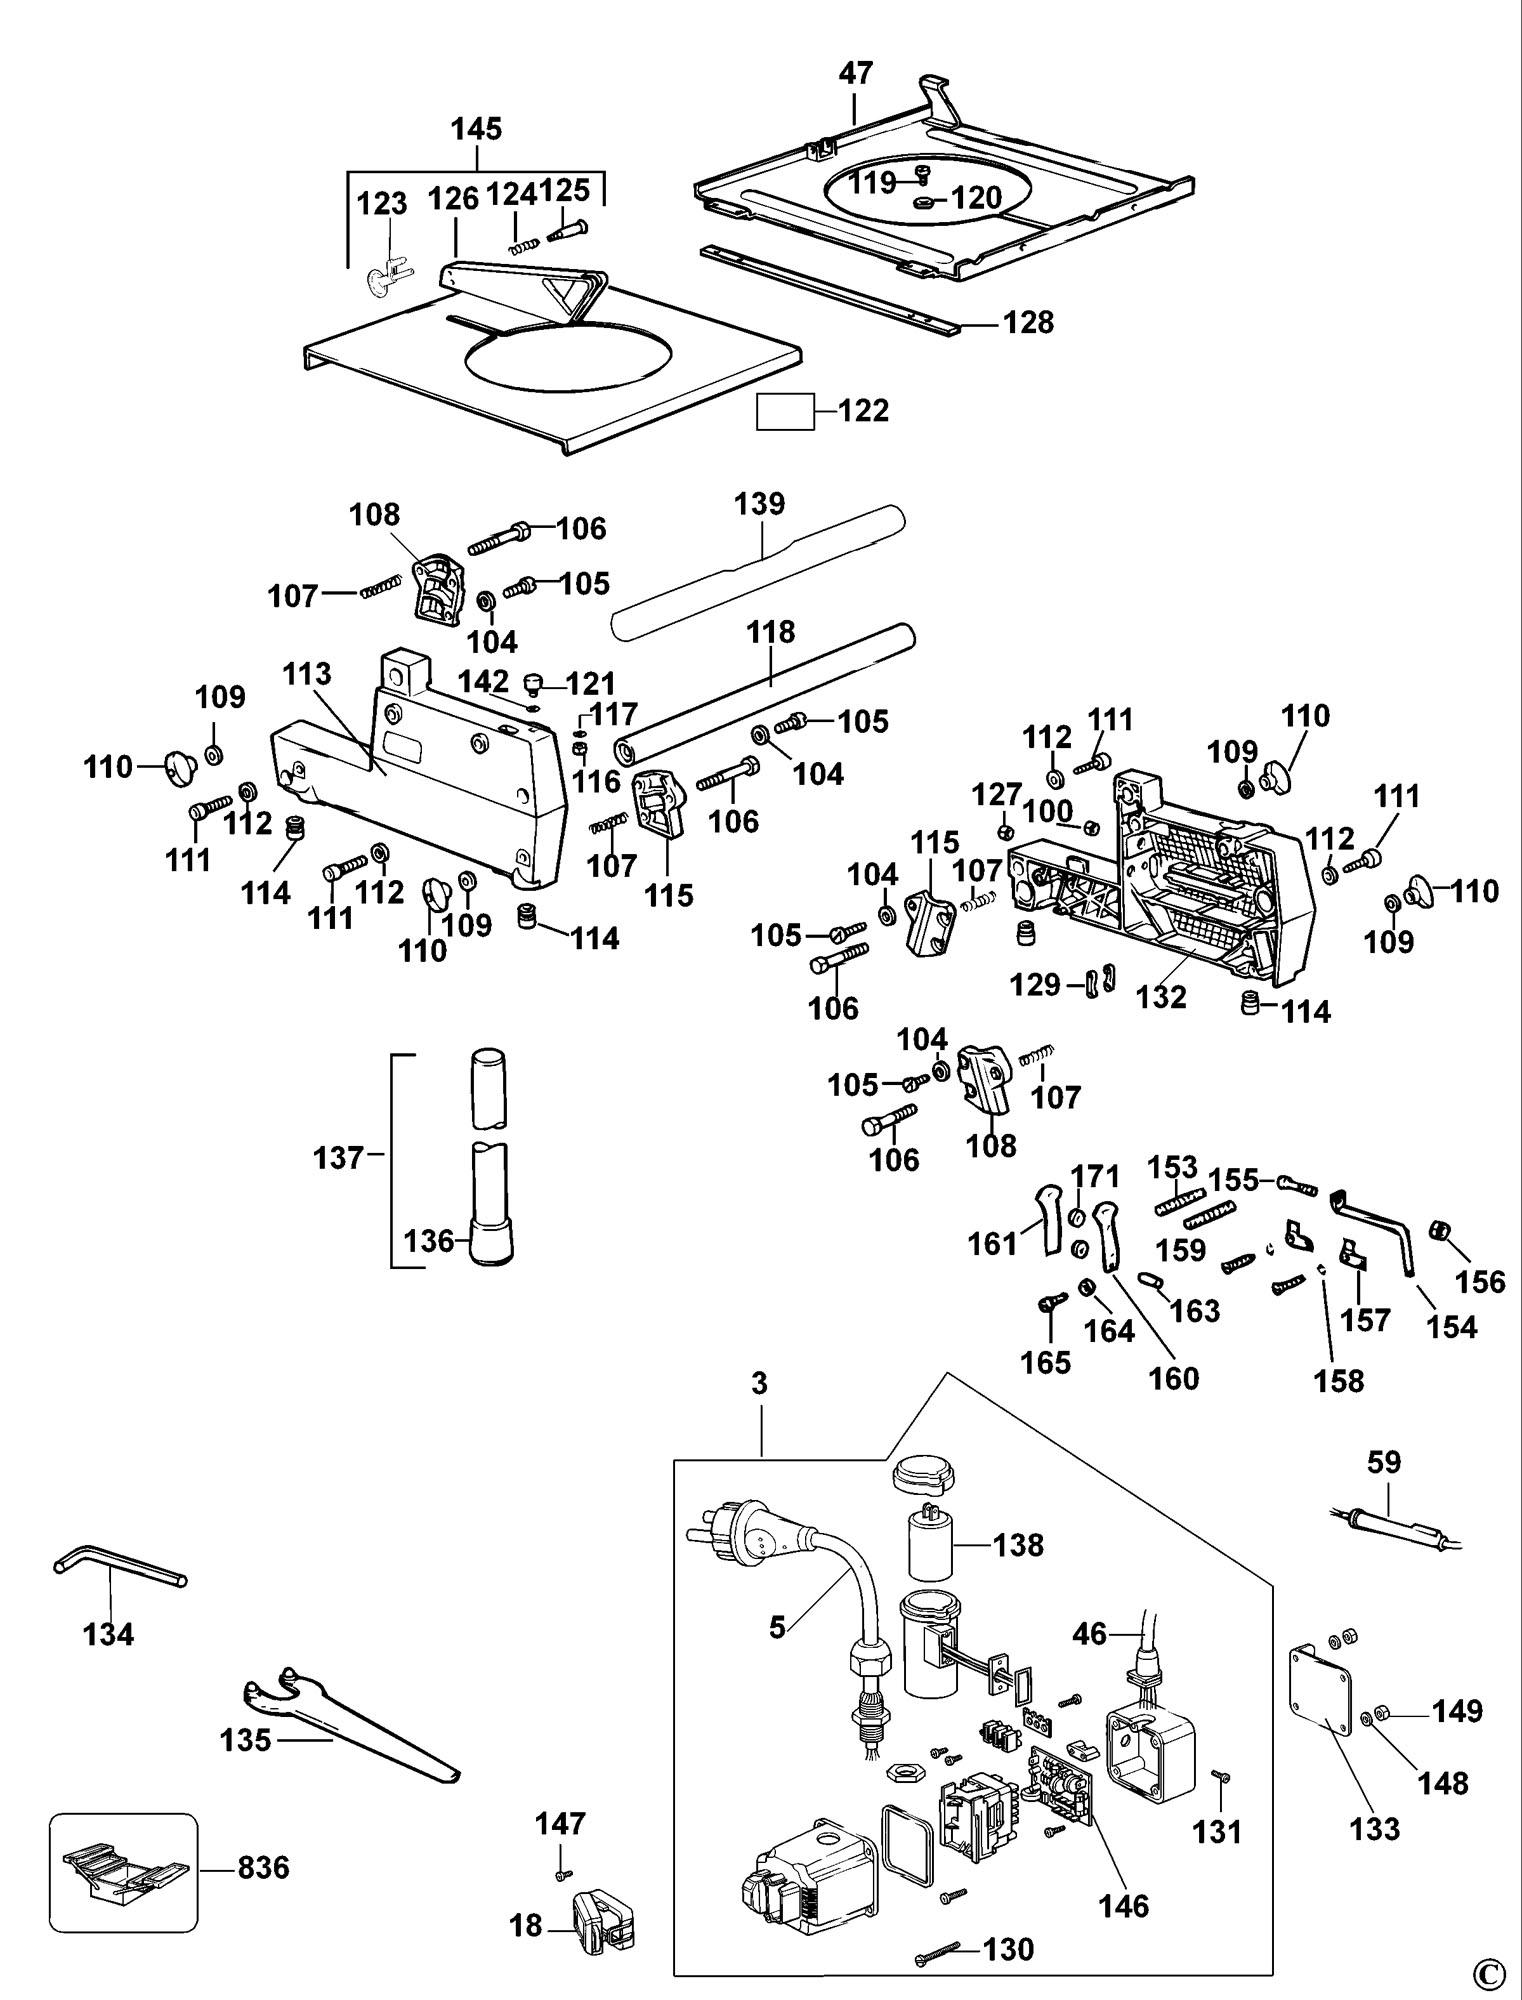 1986 bayliner capri wiring diagram rotronics dual battery system trophy 1987